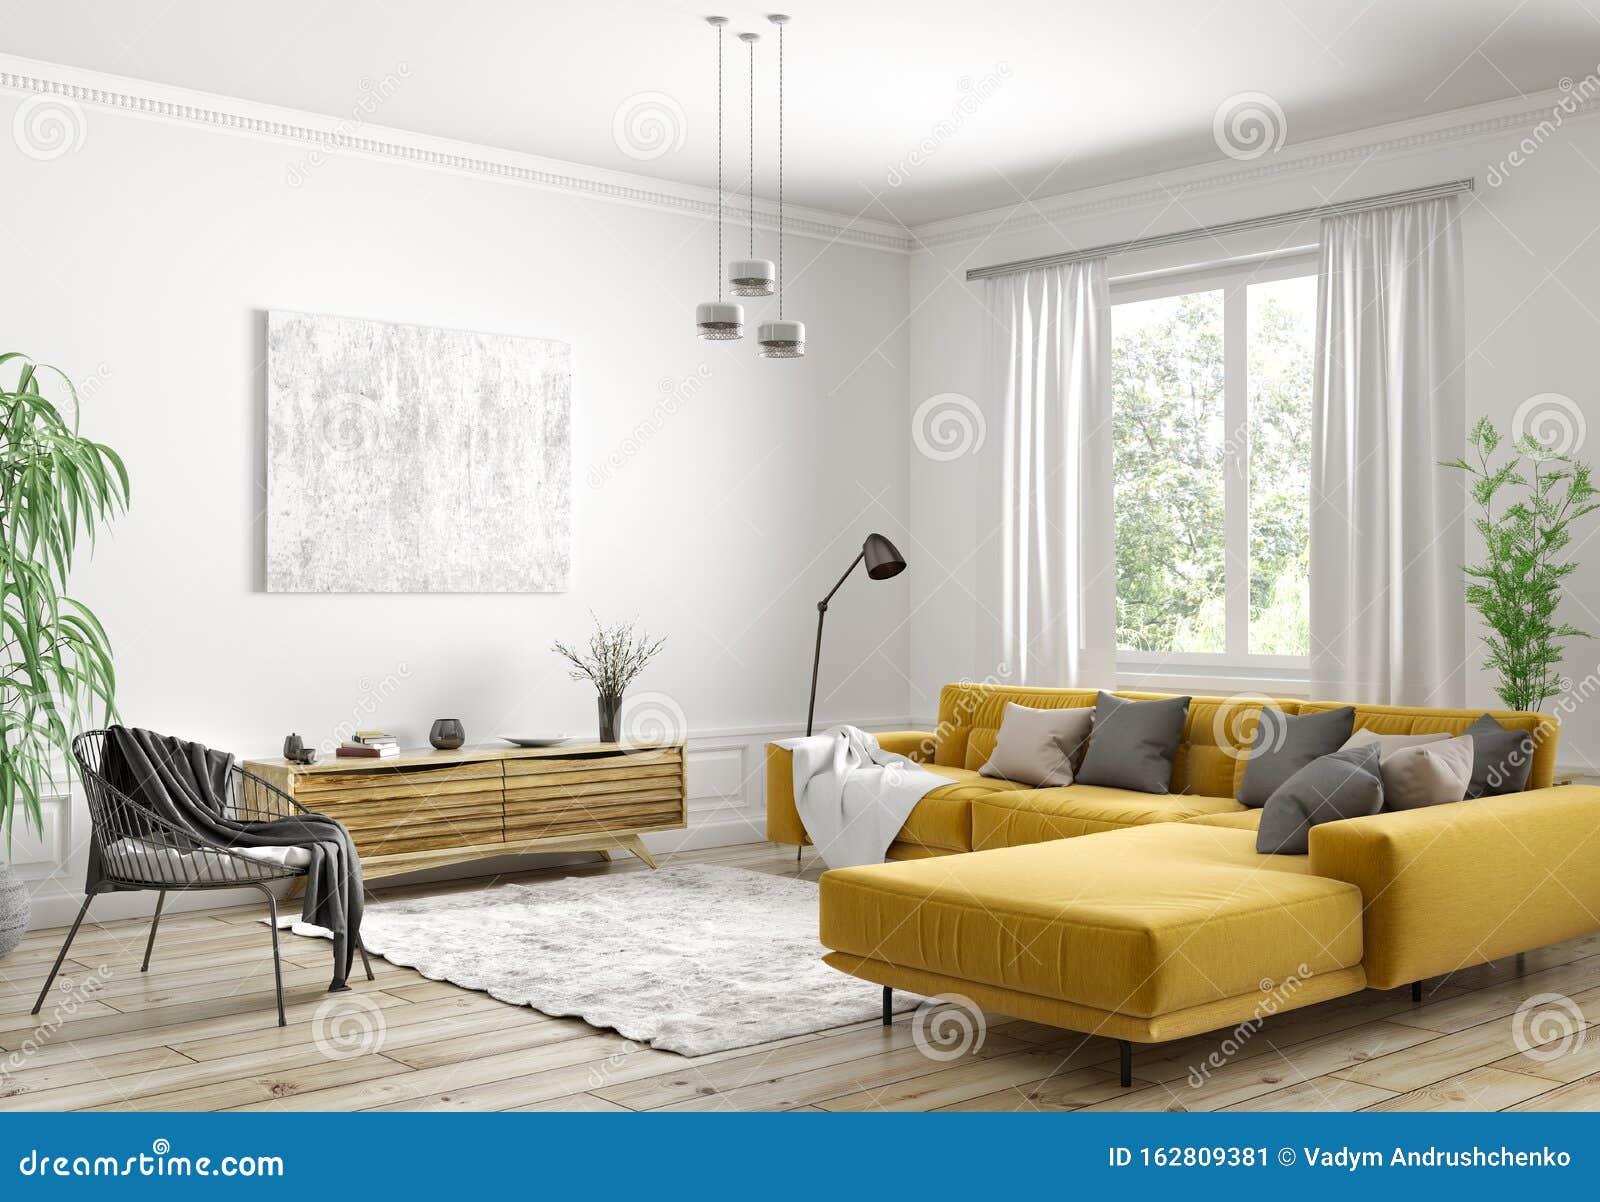 Interior Design Of Modern Scandinavian Apartment Living Room 3d Rendering Stock Illustration Illustration Of Couch Hardwood 162809381